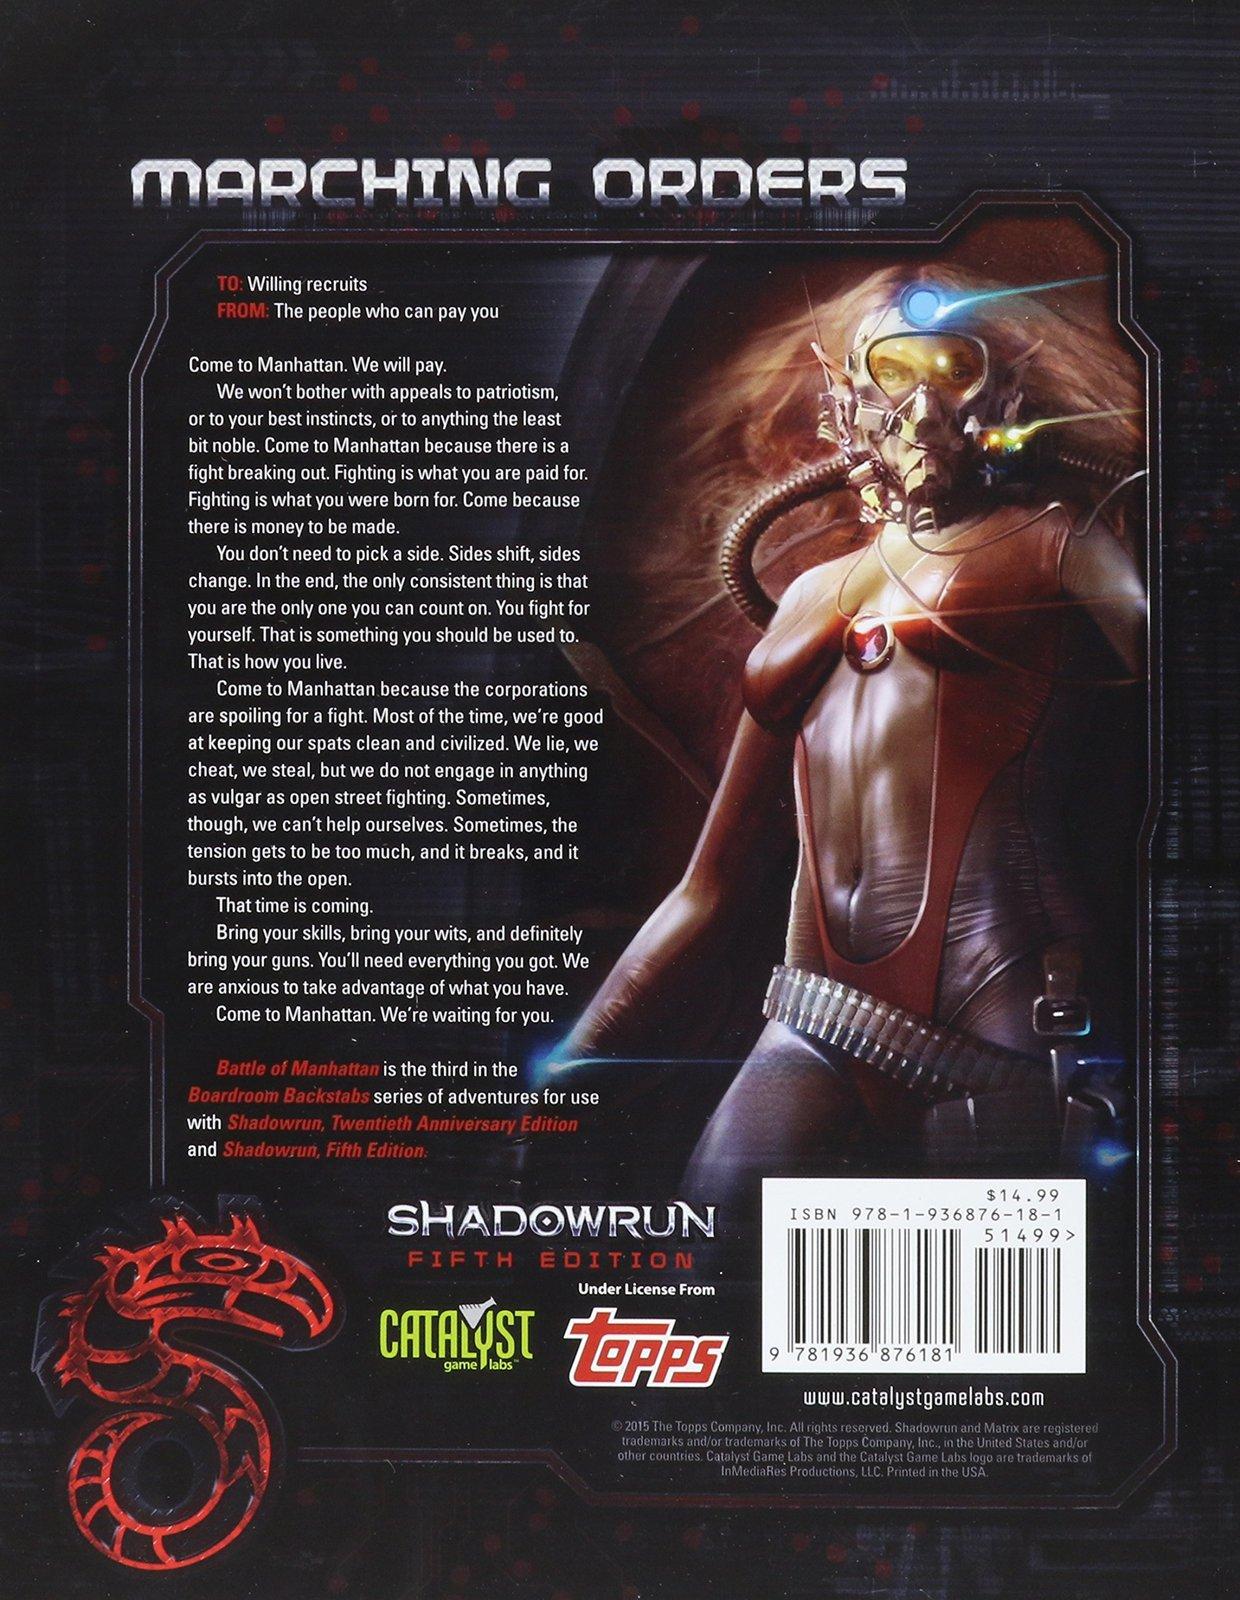 Shadowrun RPG: Battle of Manhattan - Game Supplement image